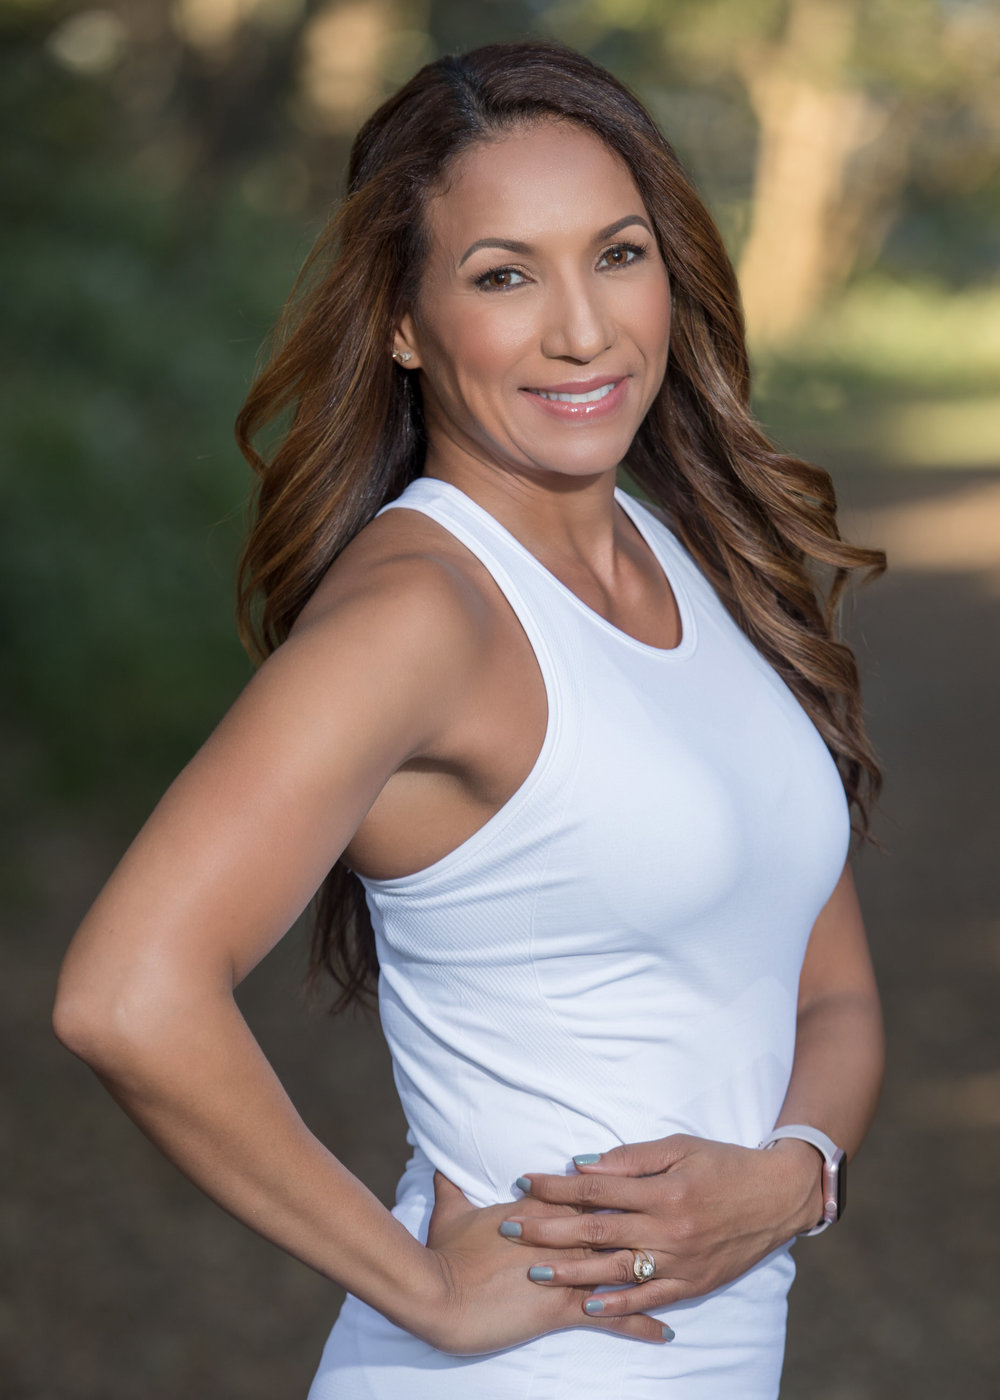 Nashville headshot for Heydi Lopez